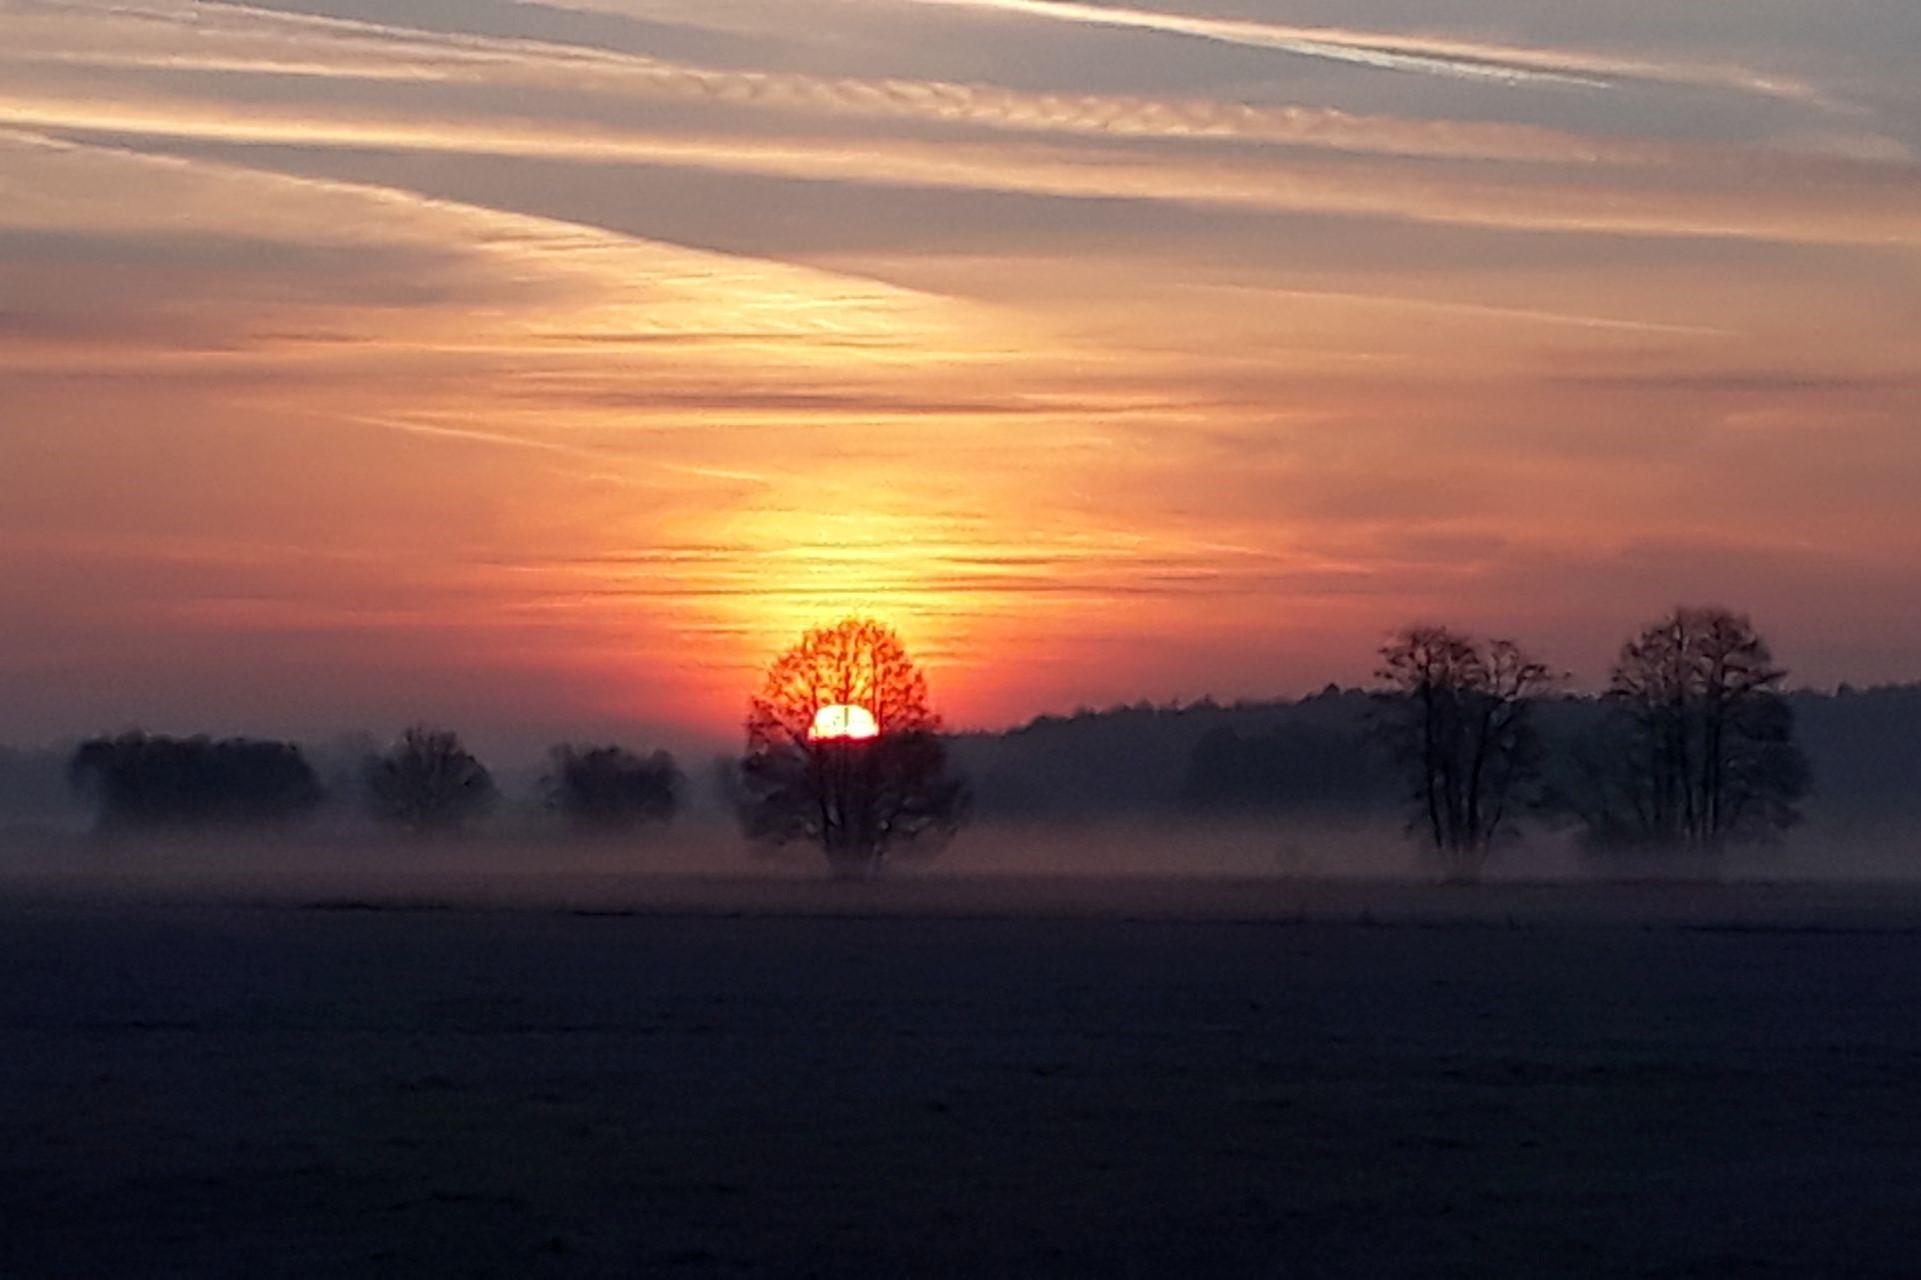 Sonnenaufgang im Labertal bei Langquaid